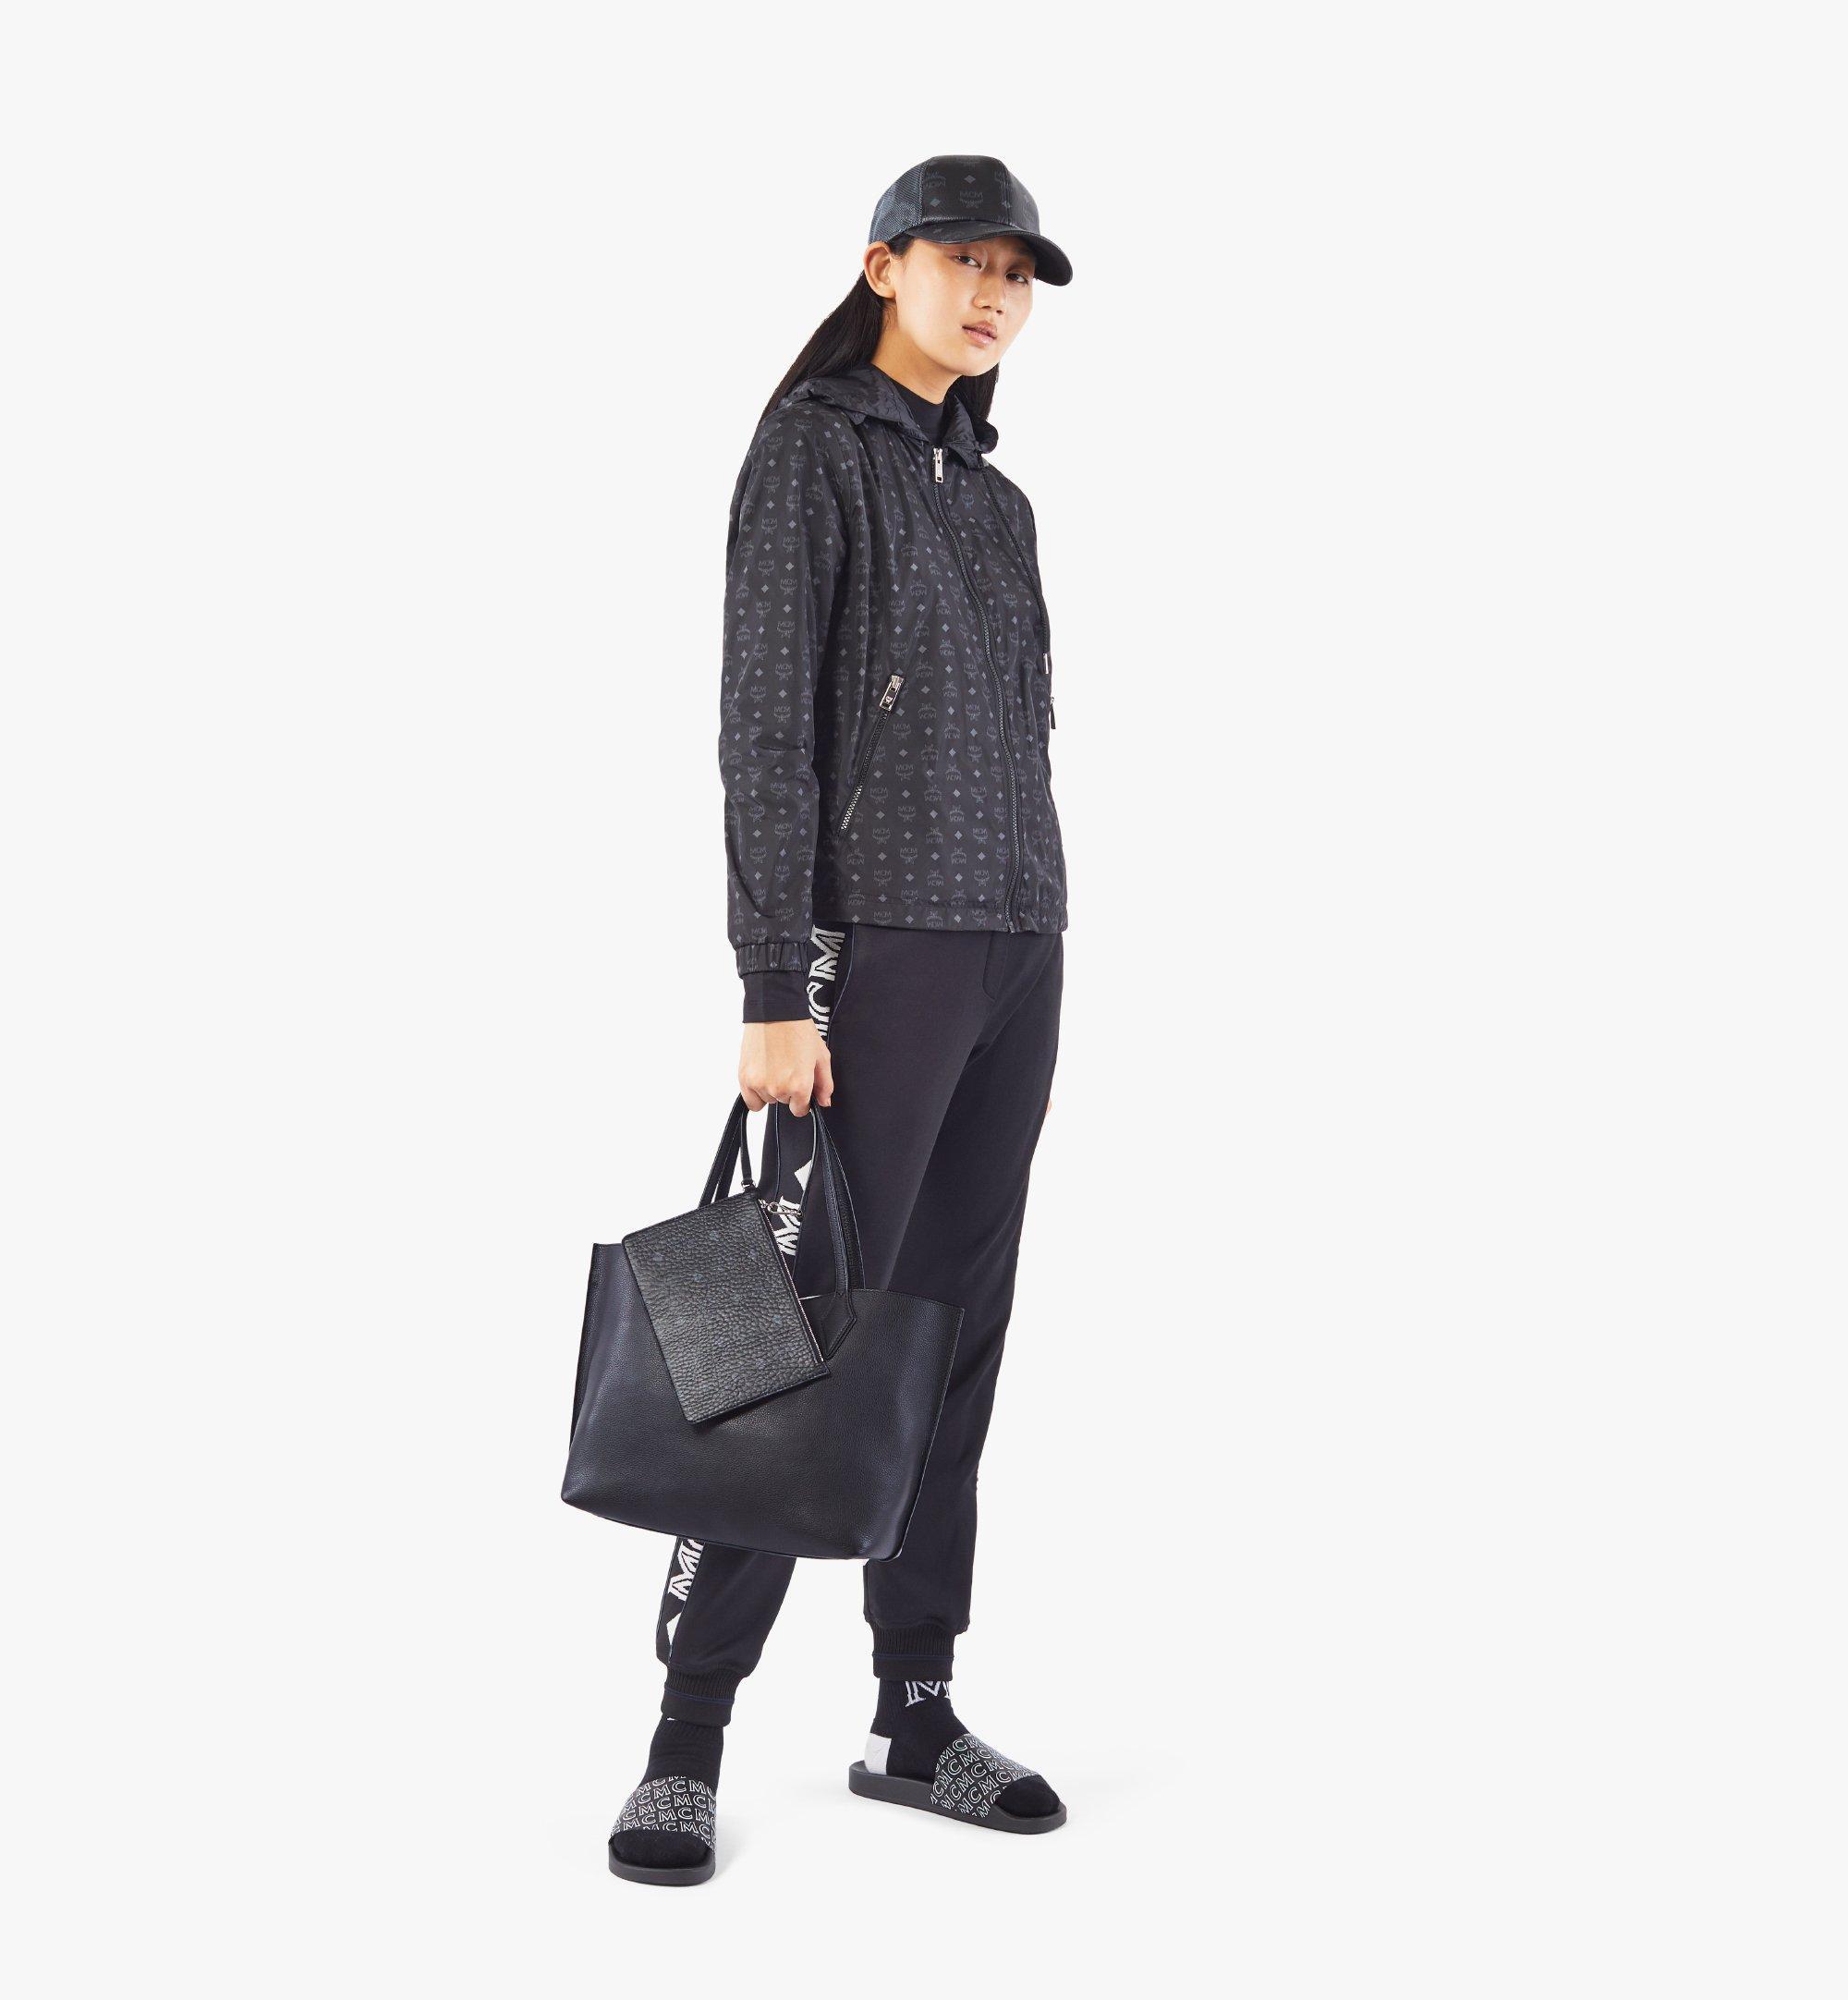 MCM Yris Tani 皮革購物袋 Black MWPAAYS01BK001 更多視圖 3